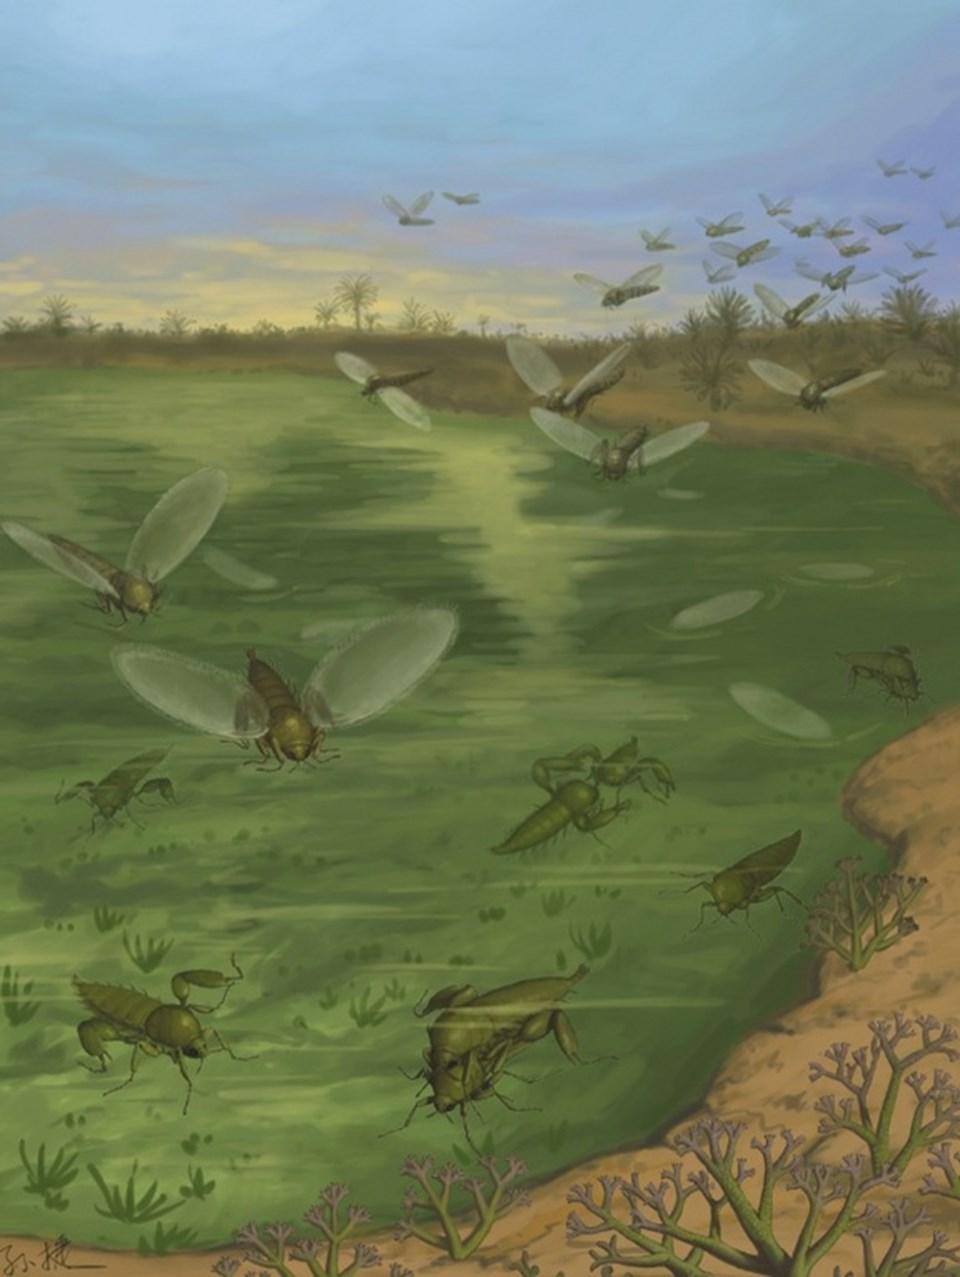 Strashilids sineklerine ait çizim.